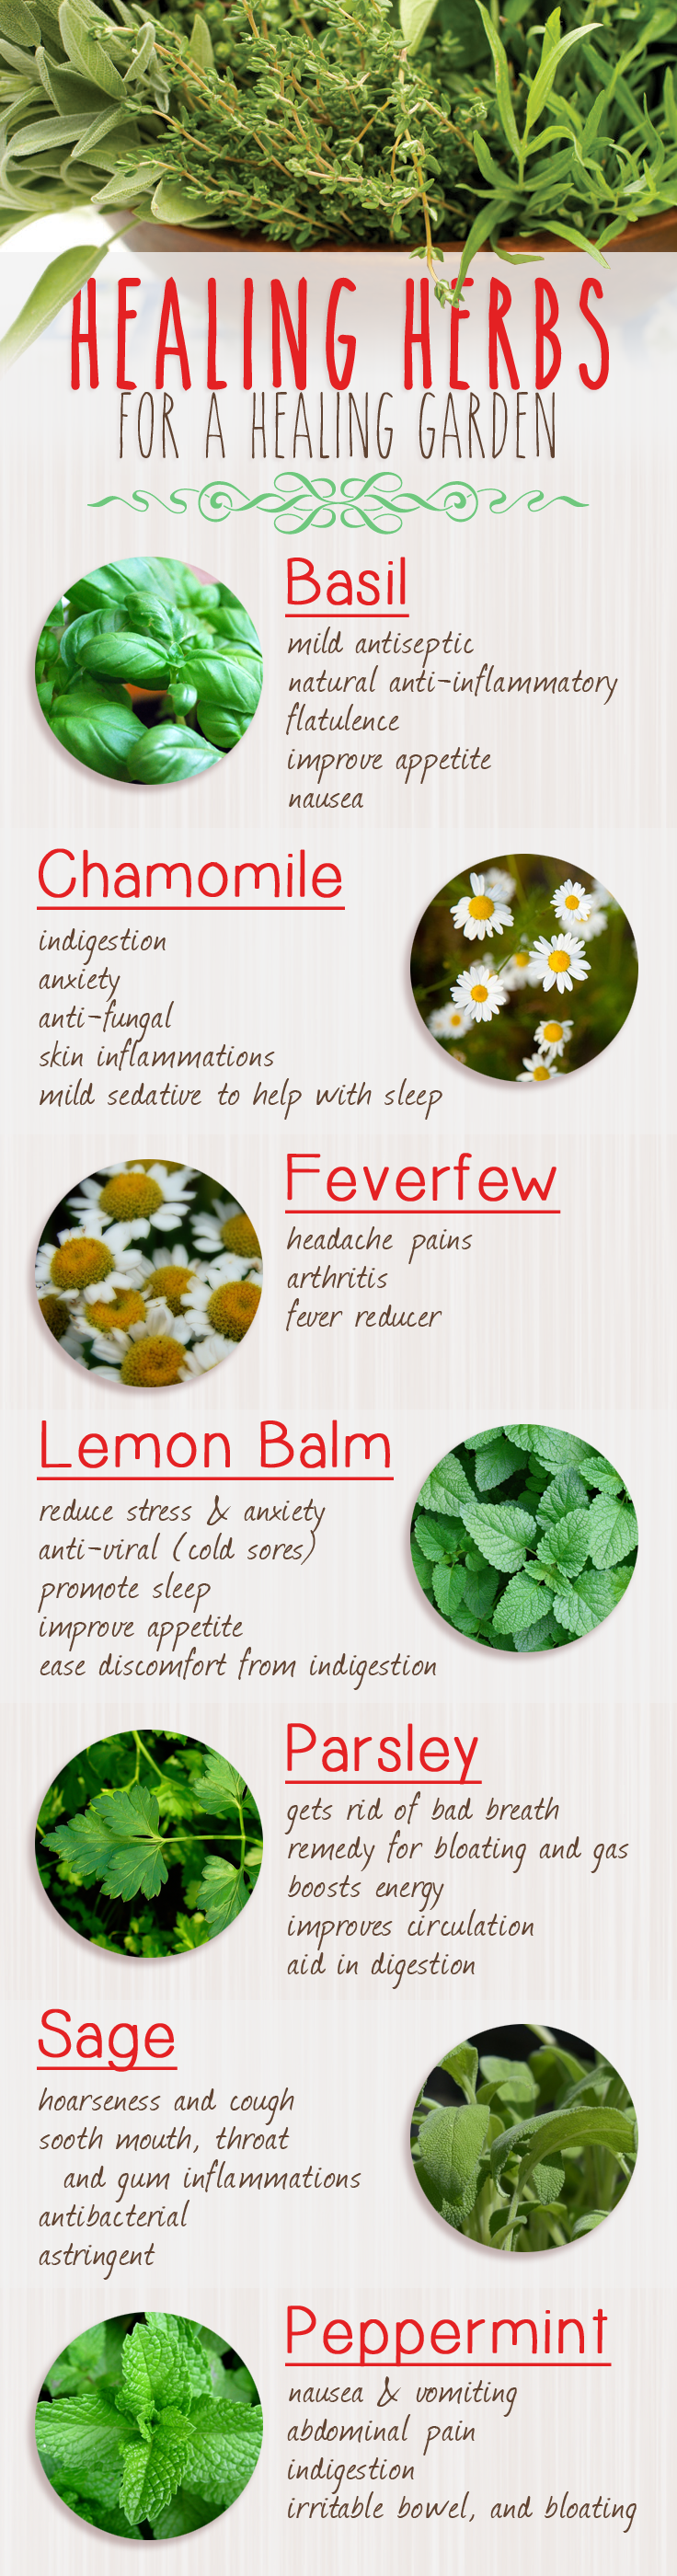 Medicinal Plants and Herbs